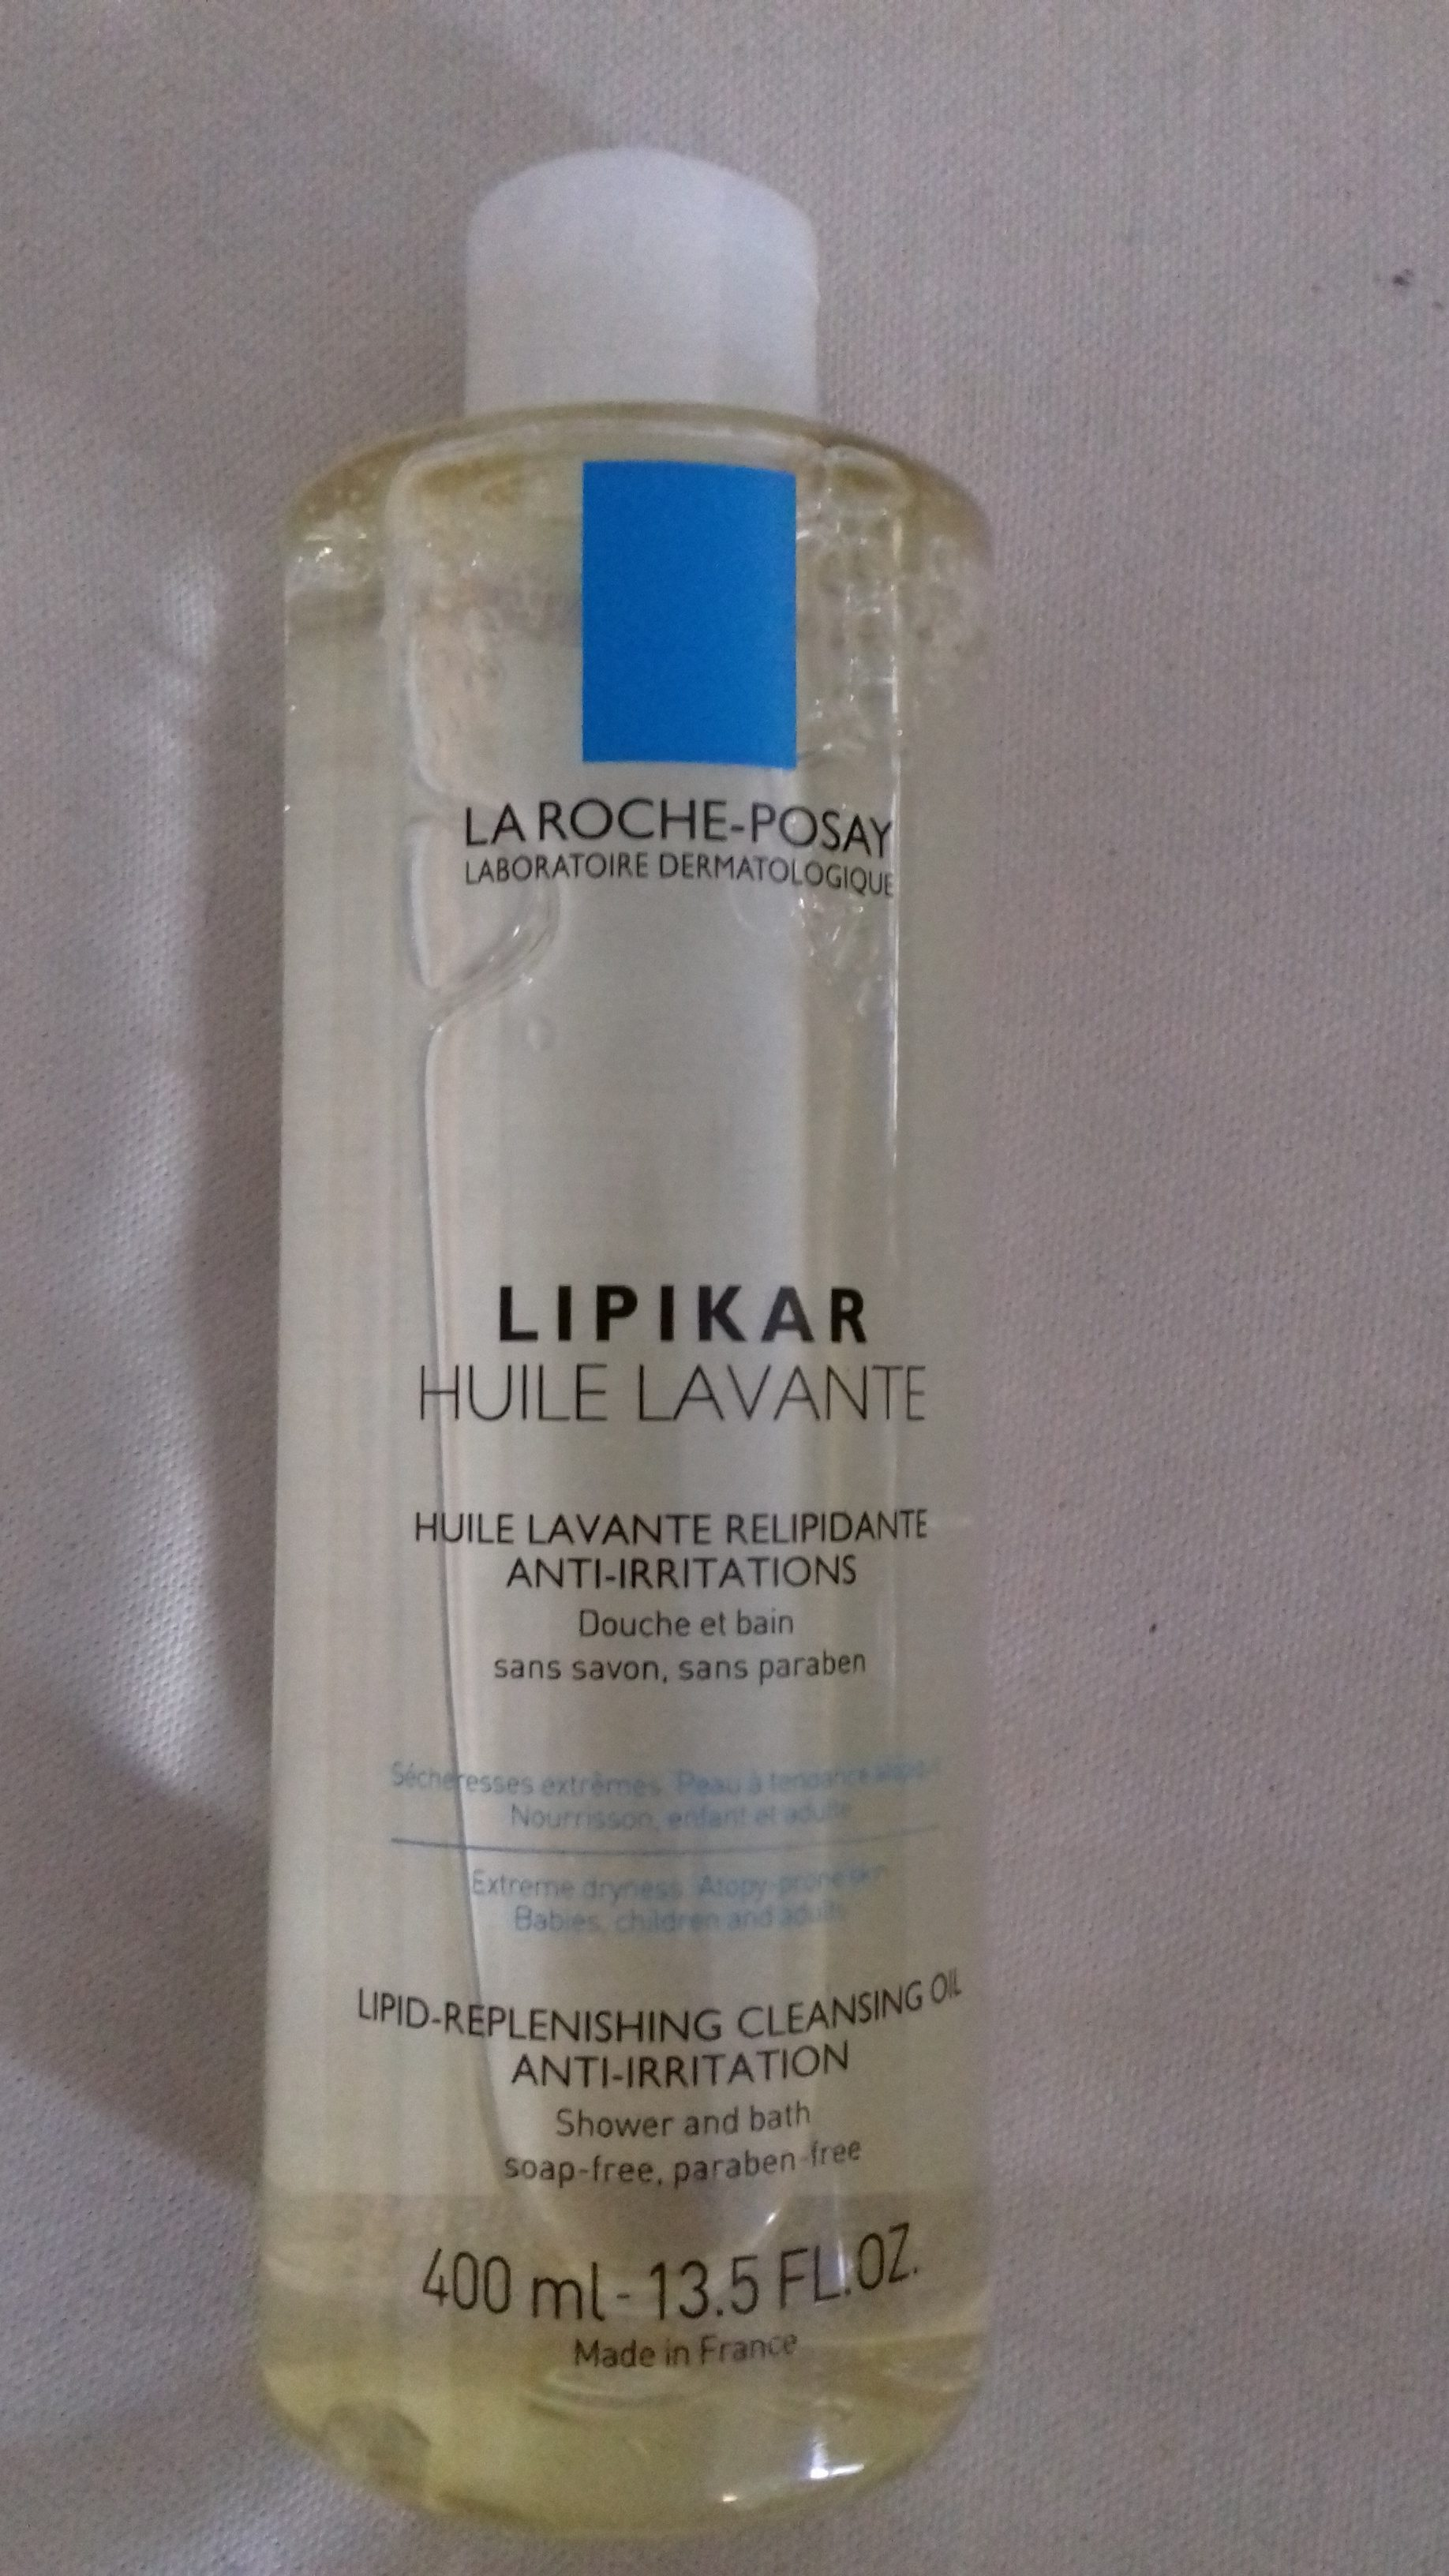 LIPIKAR Huile Lavante - Product